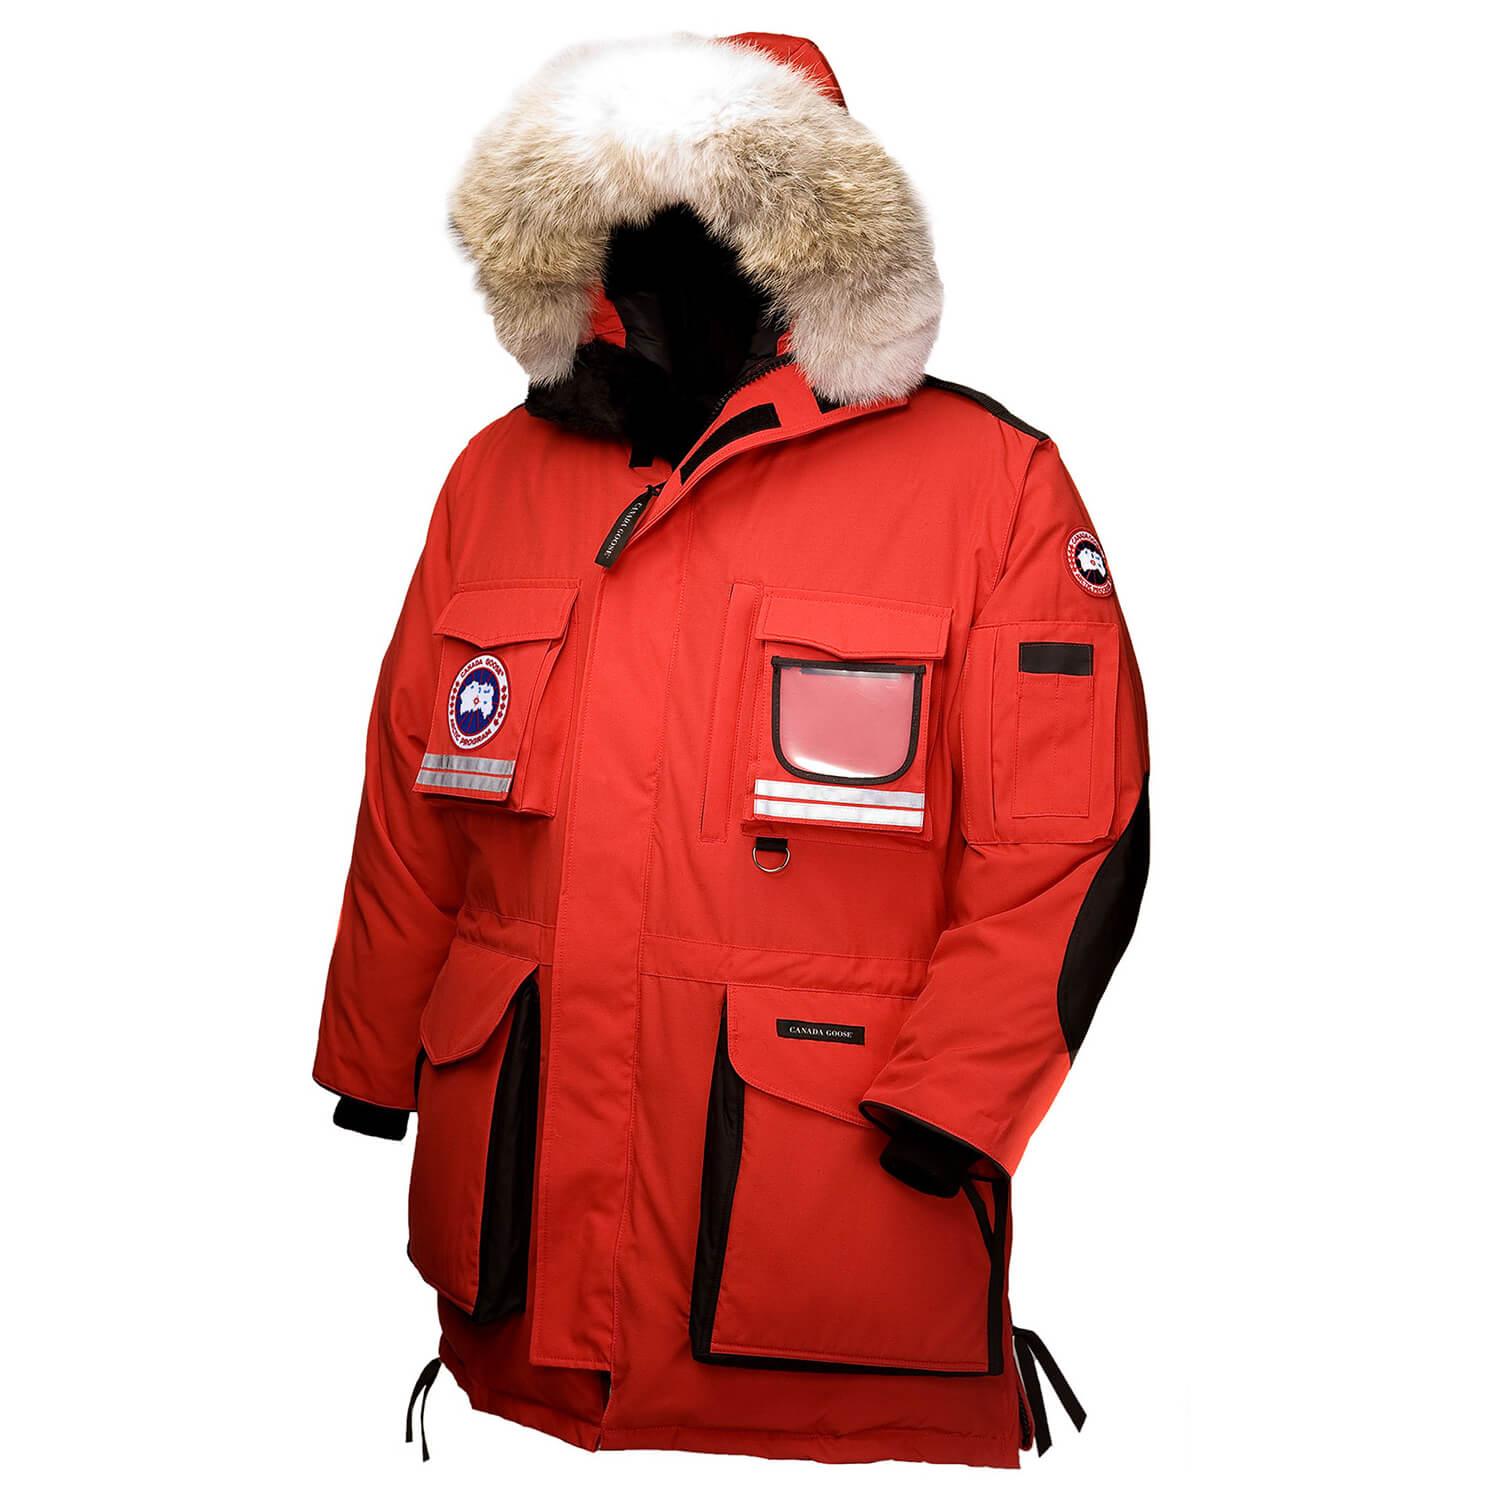 2018 Kaufen Canada Goose Jacke Outlet Herren Snow Mantra